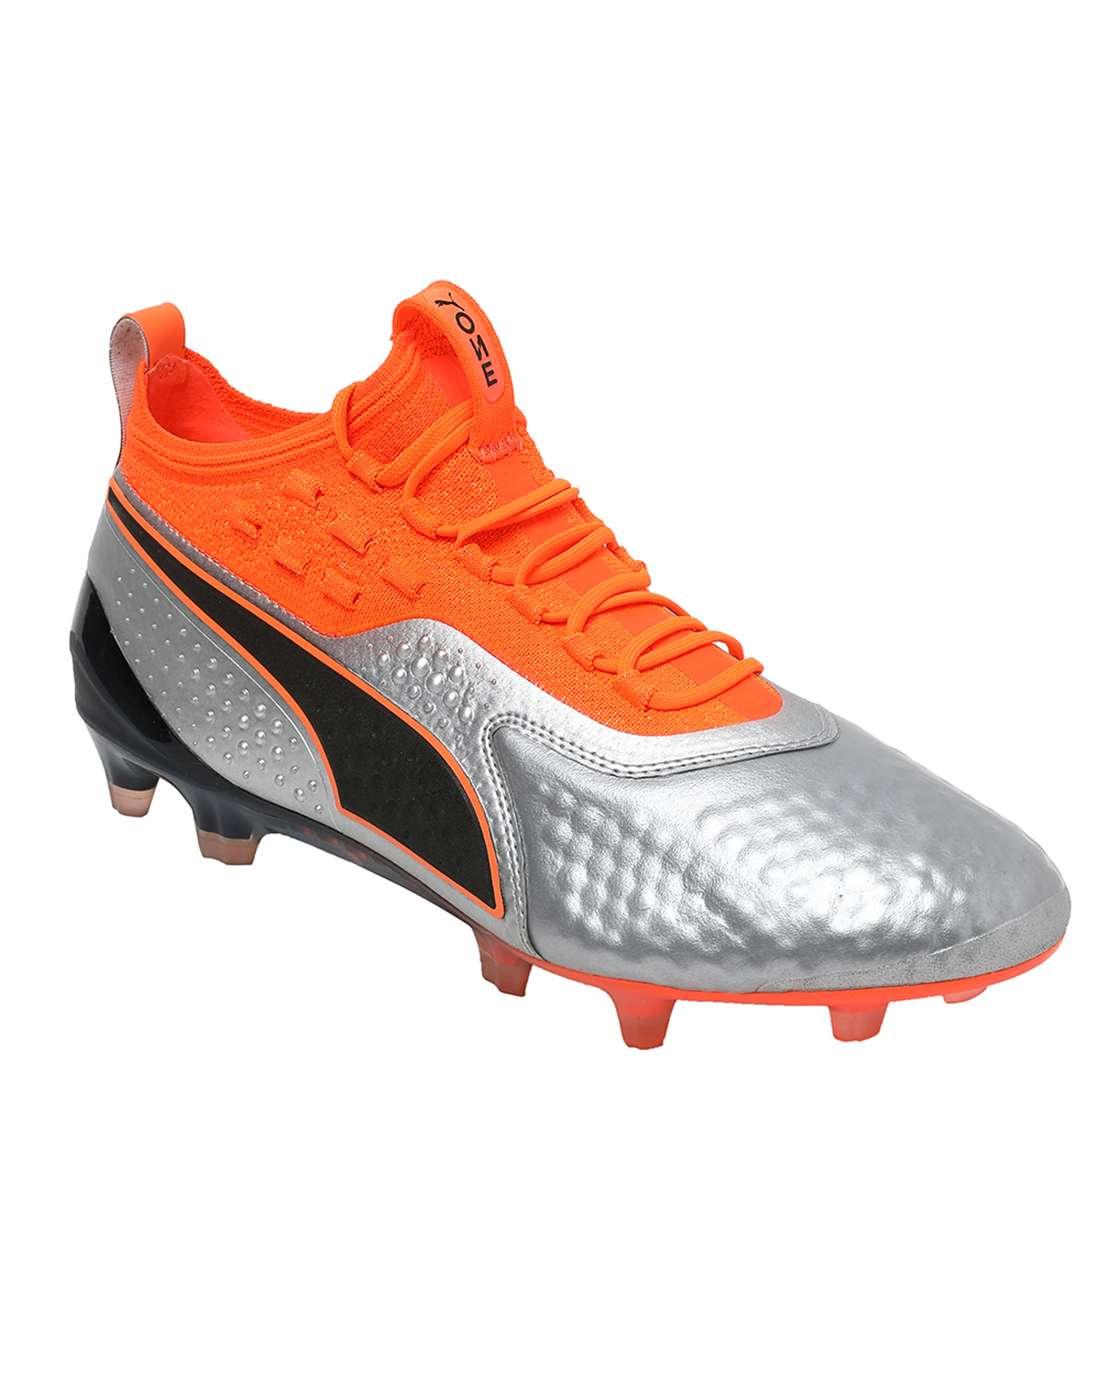 5c7533b1a7c4 ... authentic quality a1de4 bf67f Puma Mens PUMA ONE 1 Lth FGAG Multi  Football Shoes ...